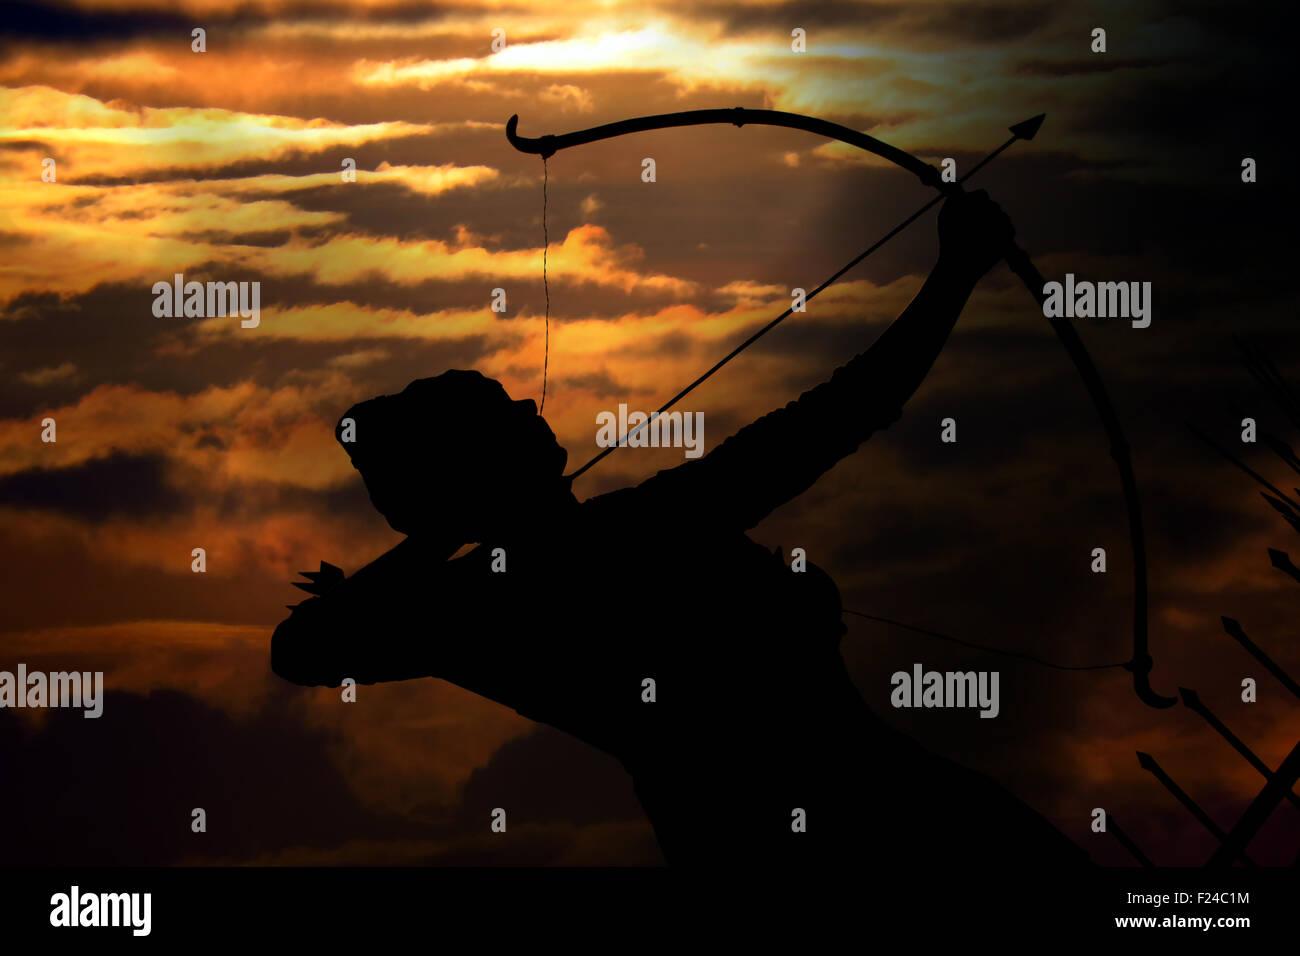 An ancient mythological archer or Arjun one of the pandavas from hindu scripture or mythology - Mahabharata on the - Stock Image